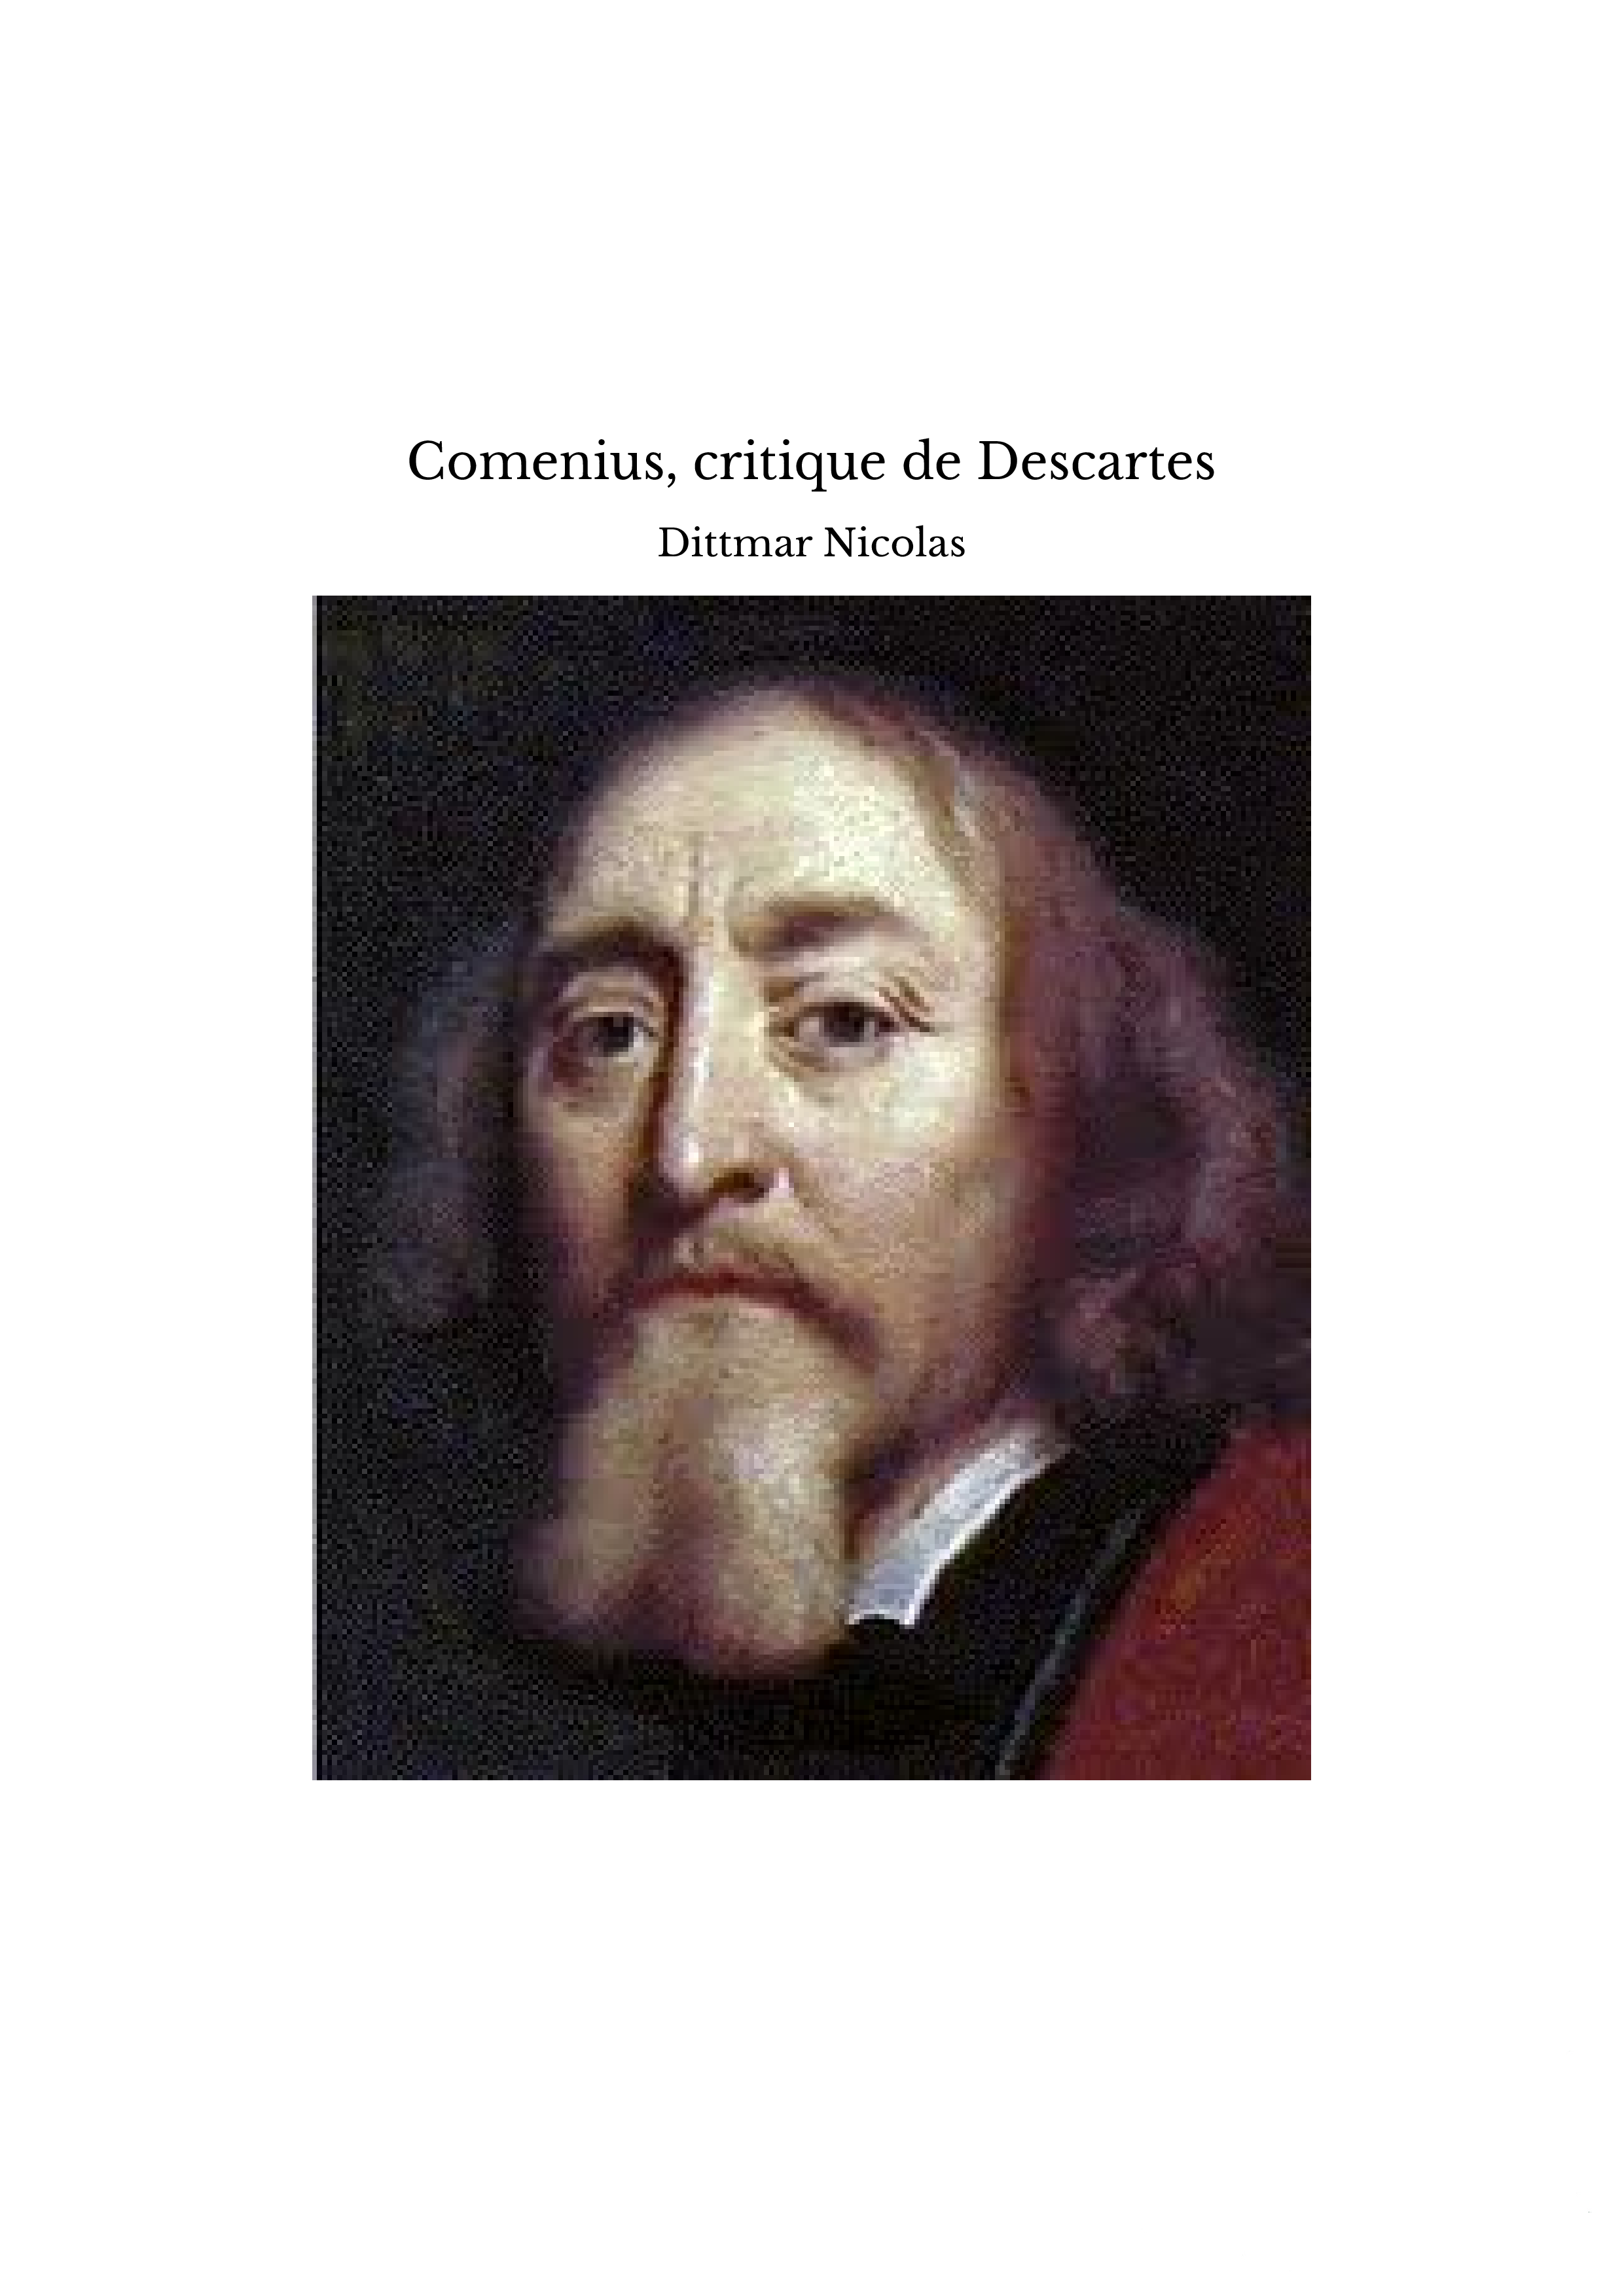 Comenius, critique de Descartes